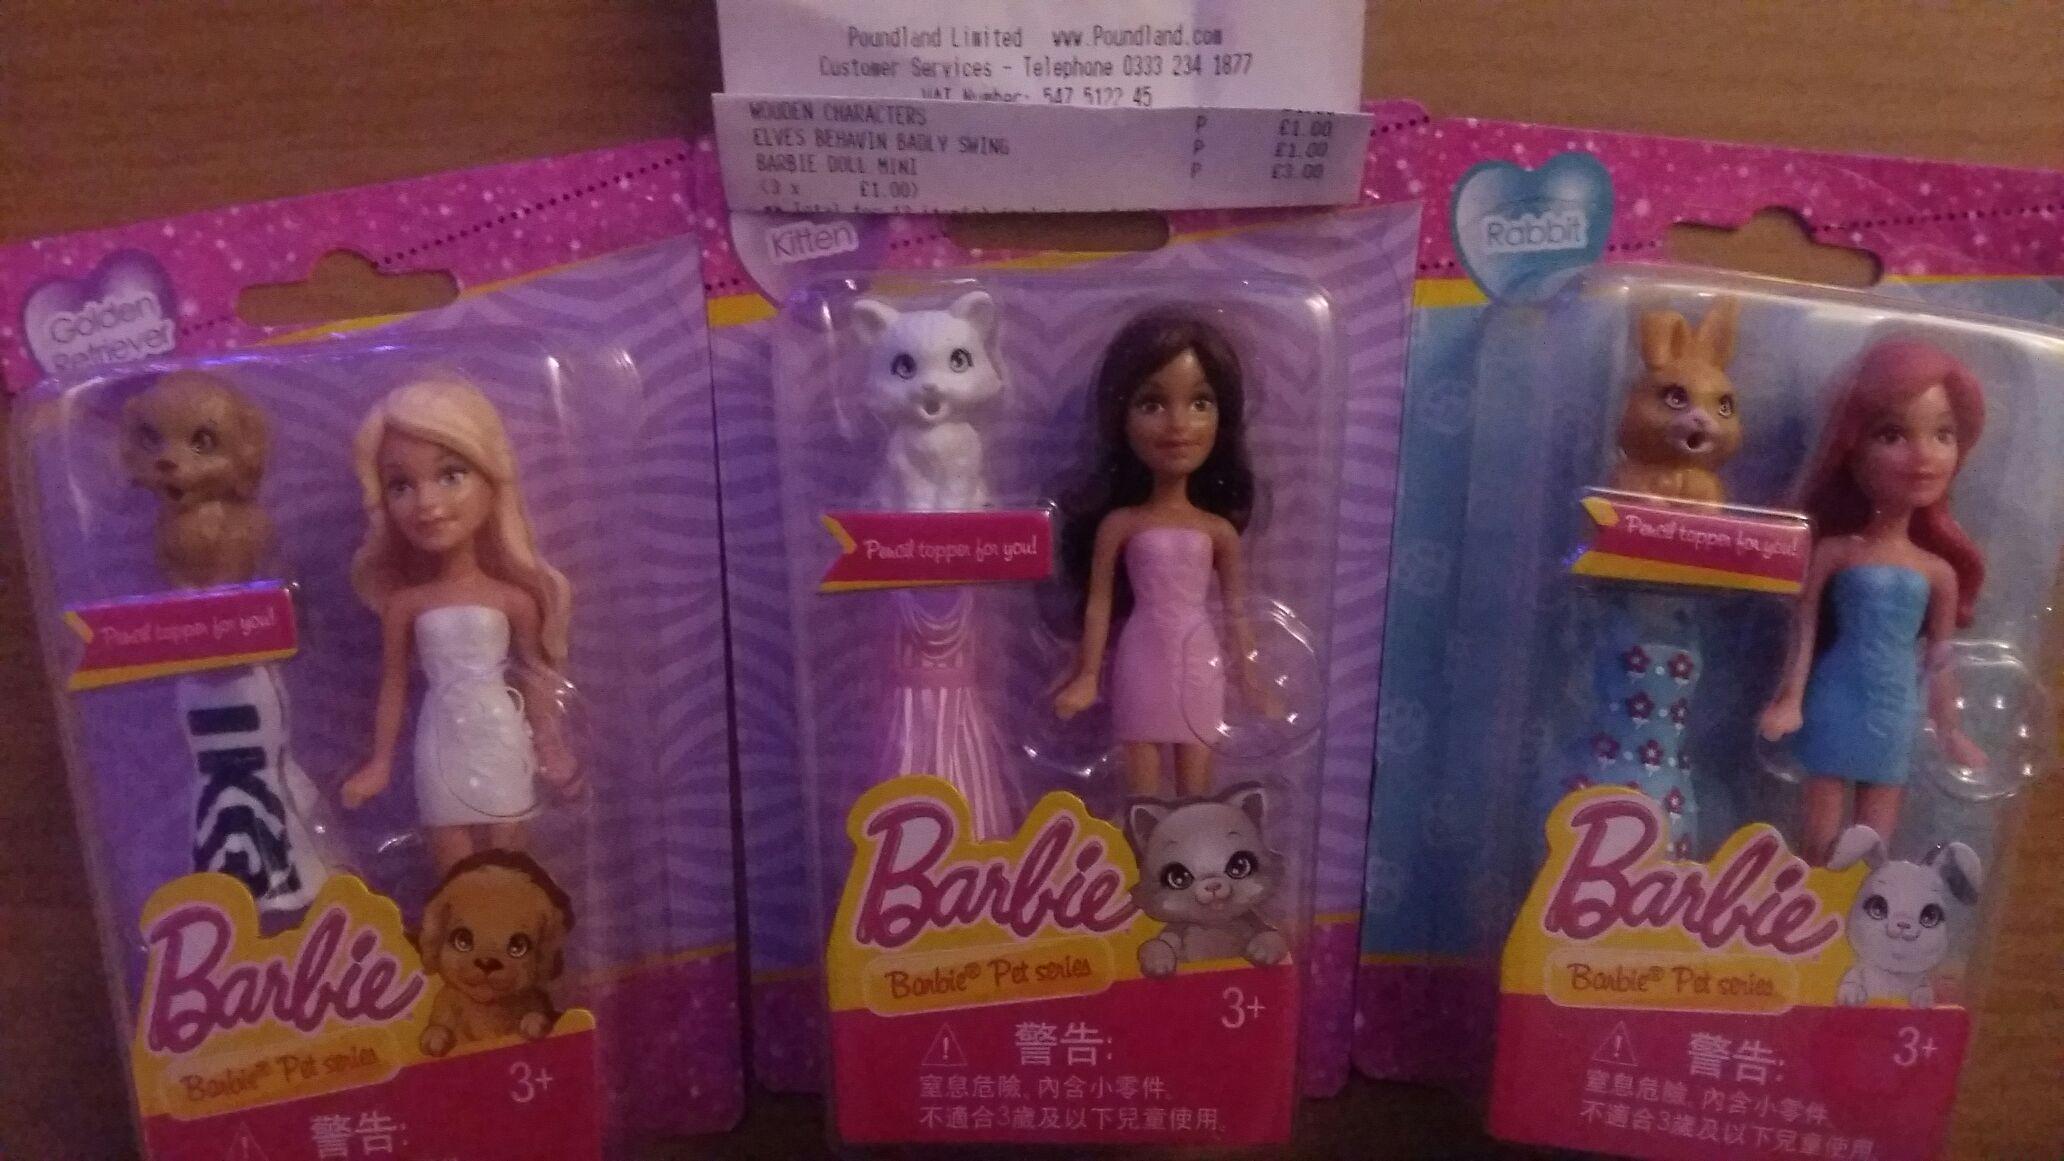 Barbie pet series £1 at Poundland